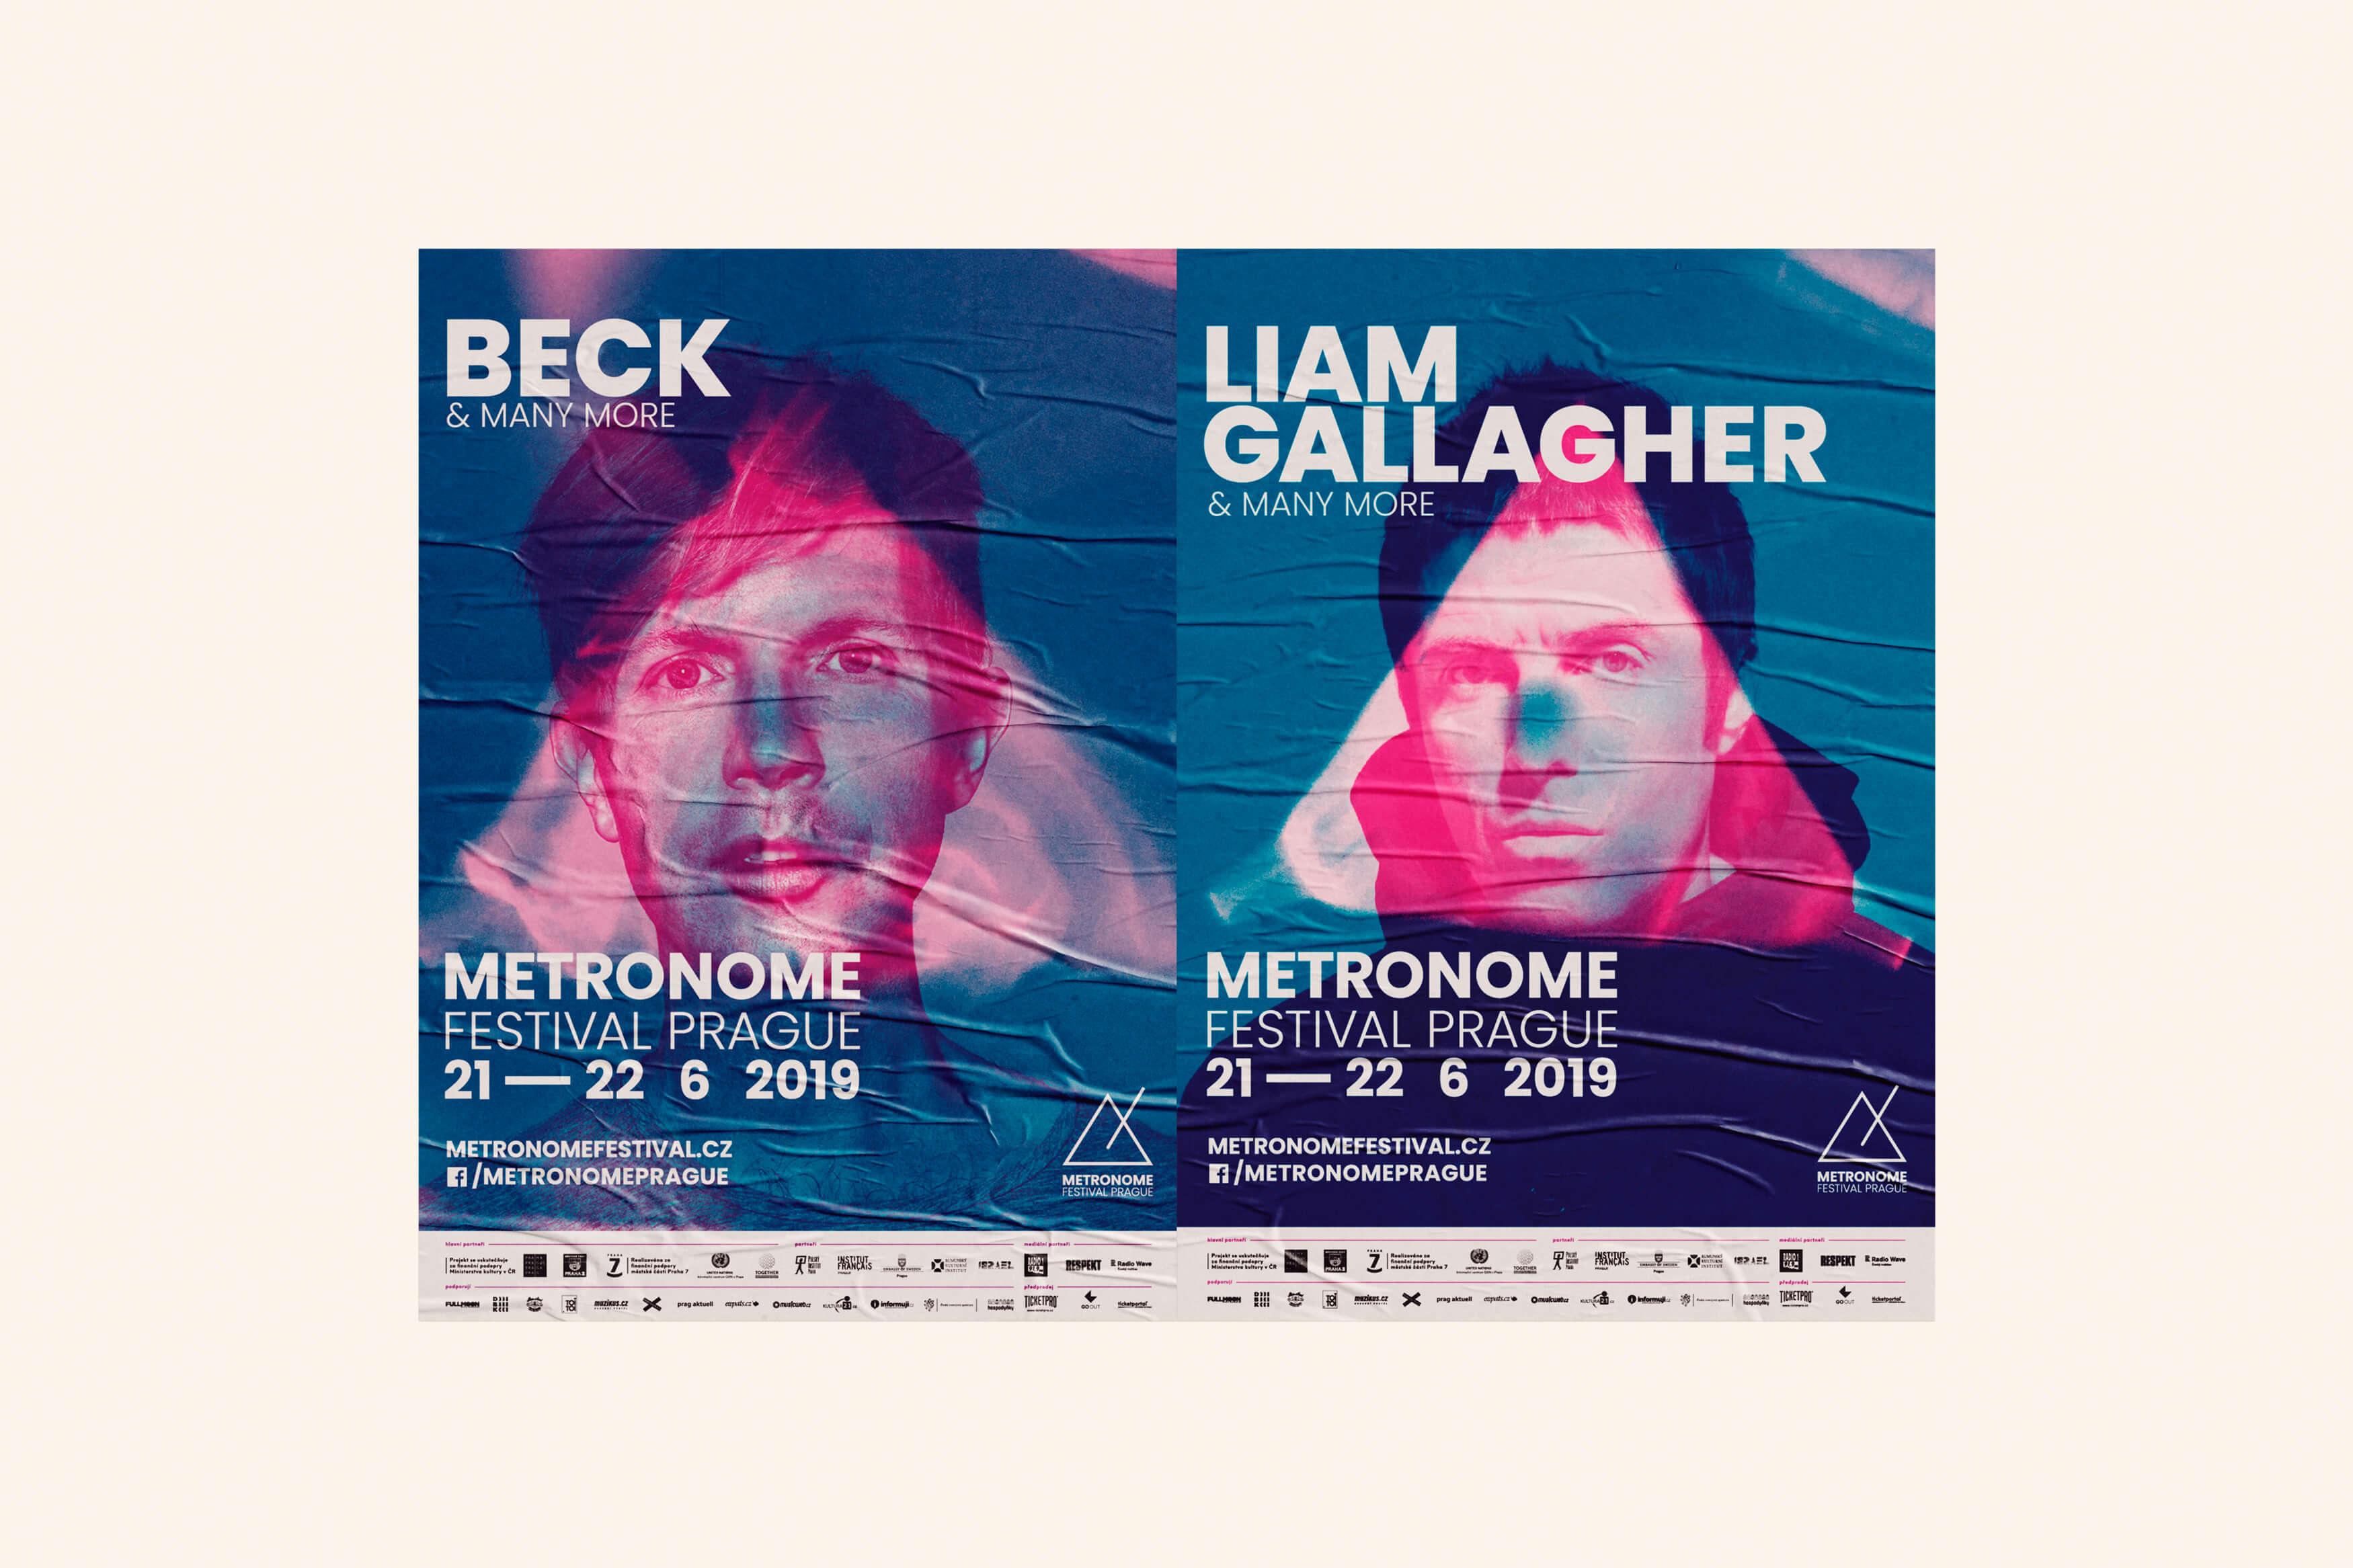 plakat-metronome-2019